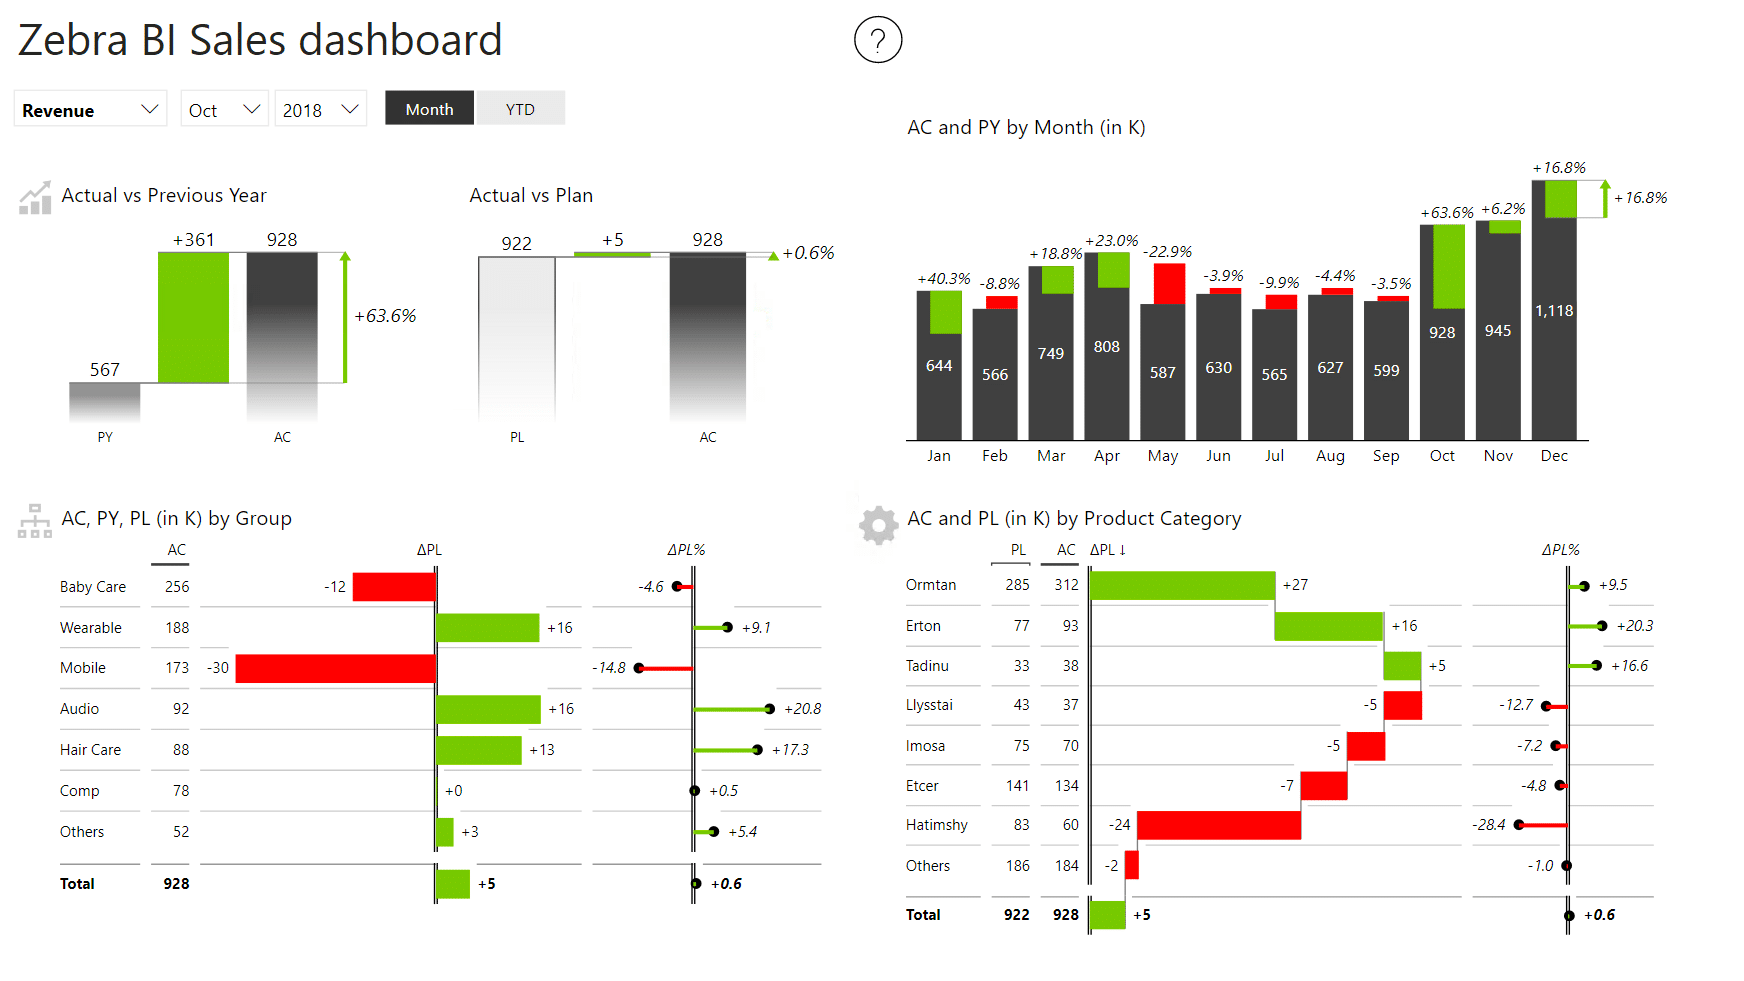 Sales dashboard using default Zebra BI Power BI theme